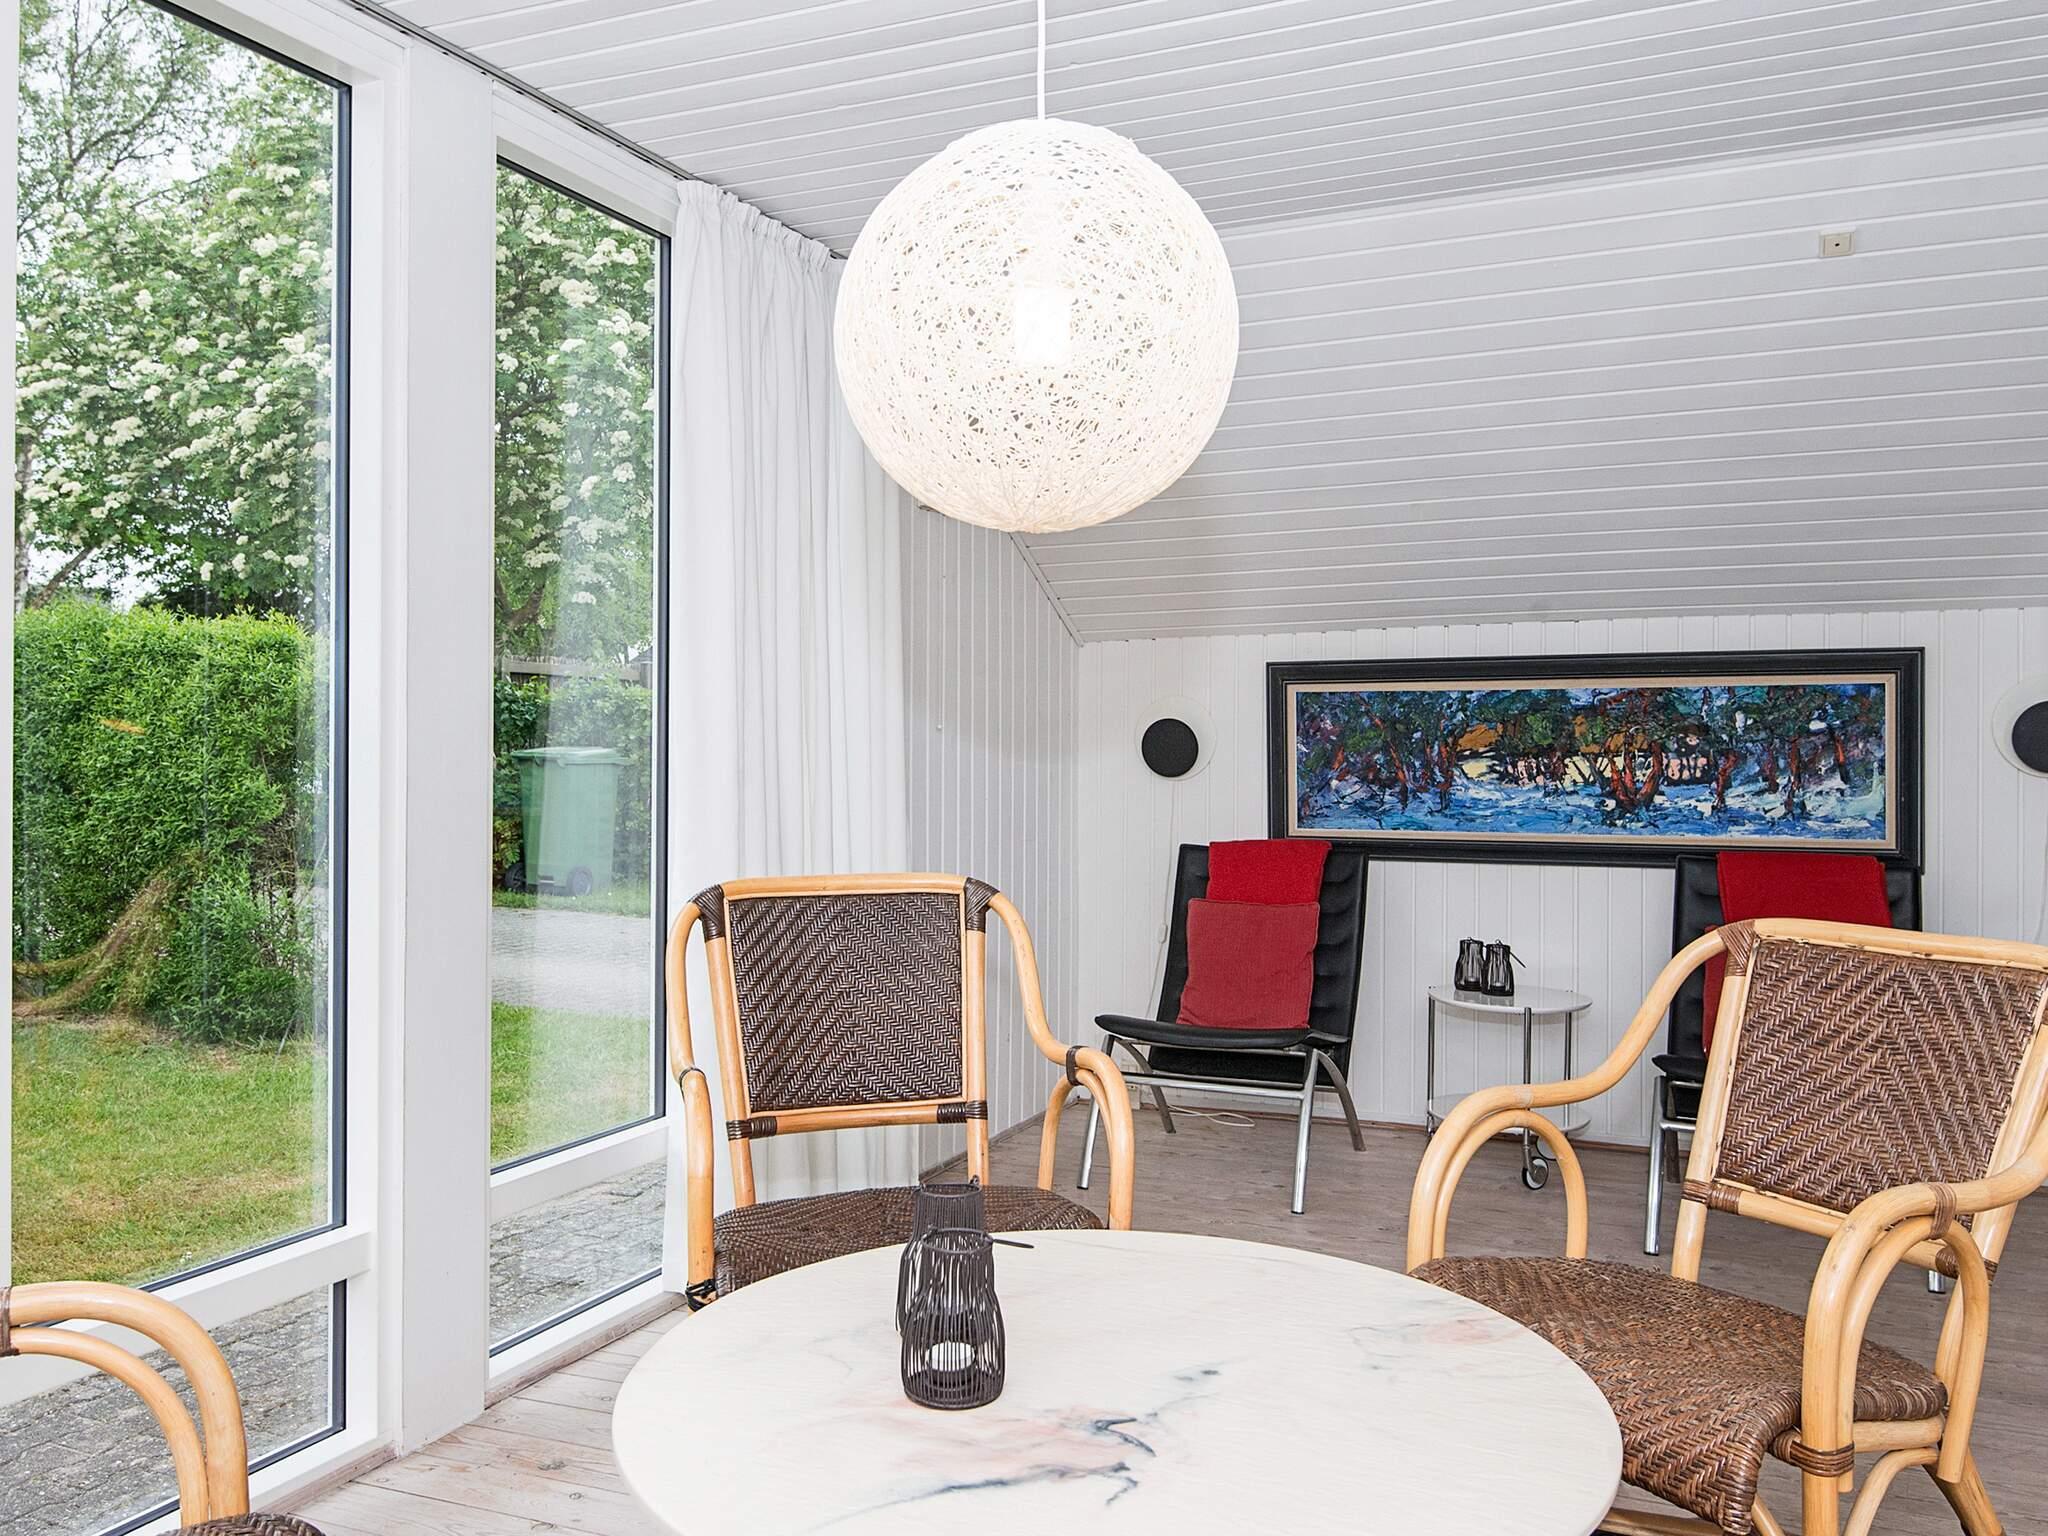 Ferienhaus Sædding (470666), Esbjerg V, , Südwestjütland, Dänemark, Bild 16